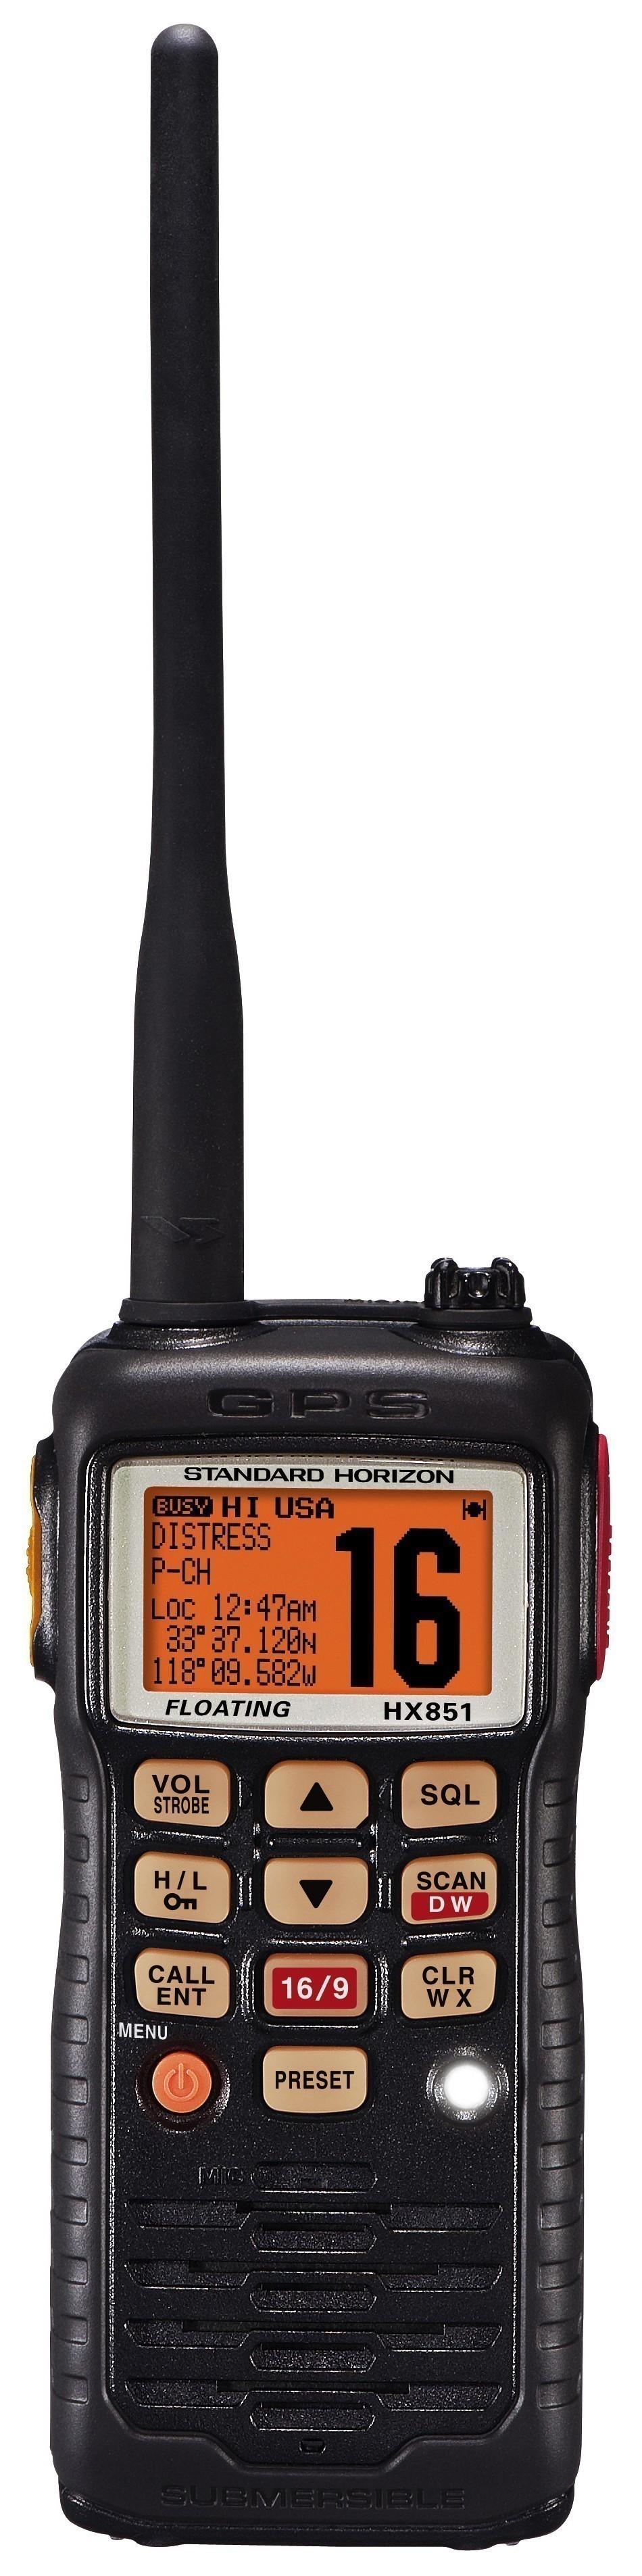 Portable Marine Radios